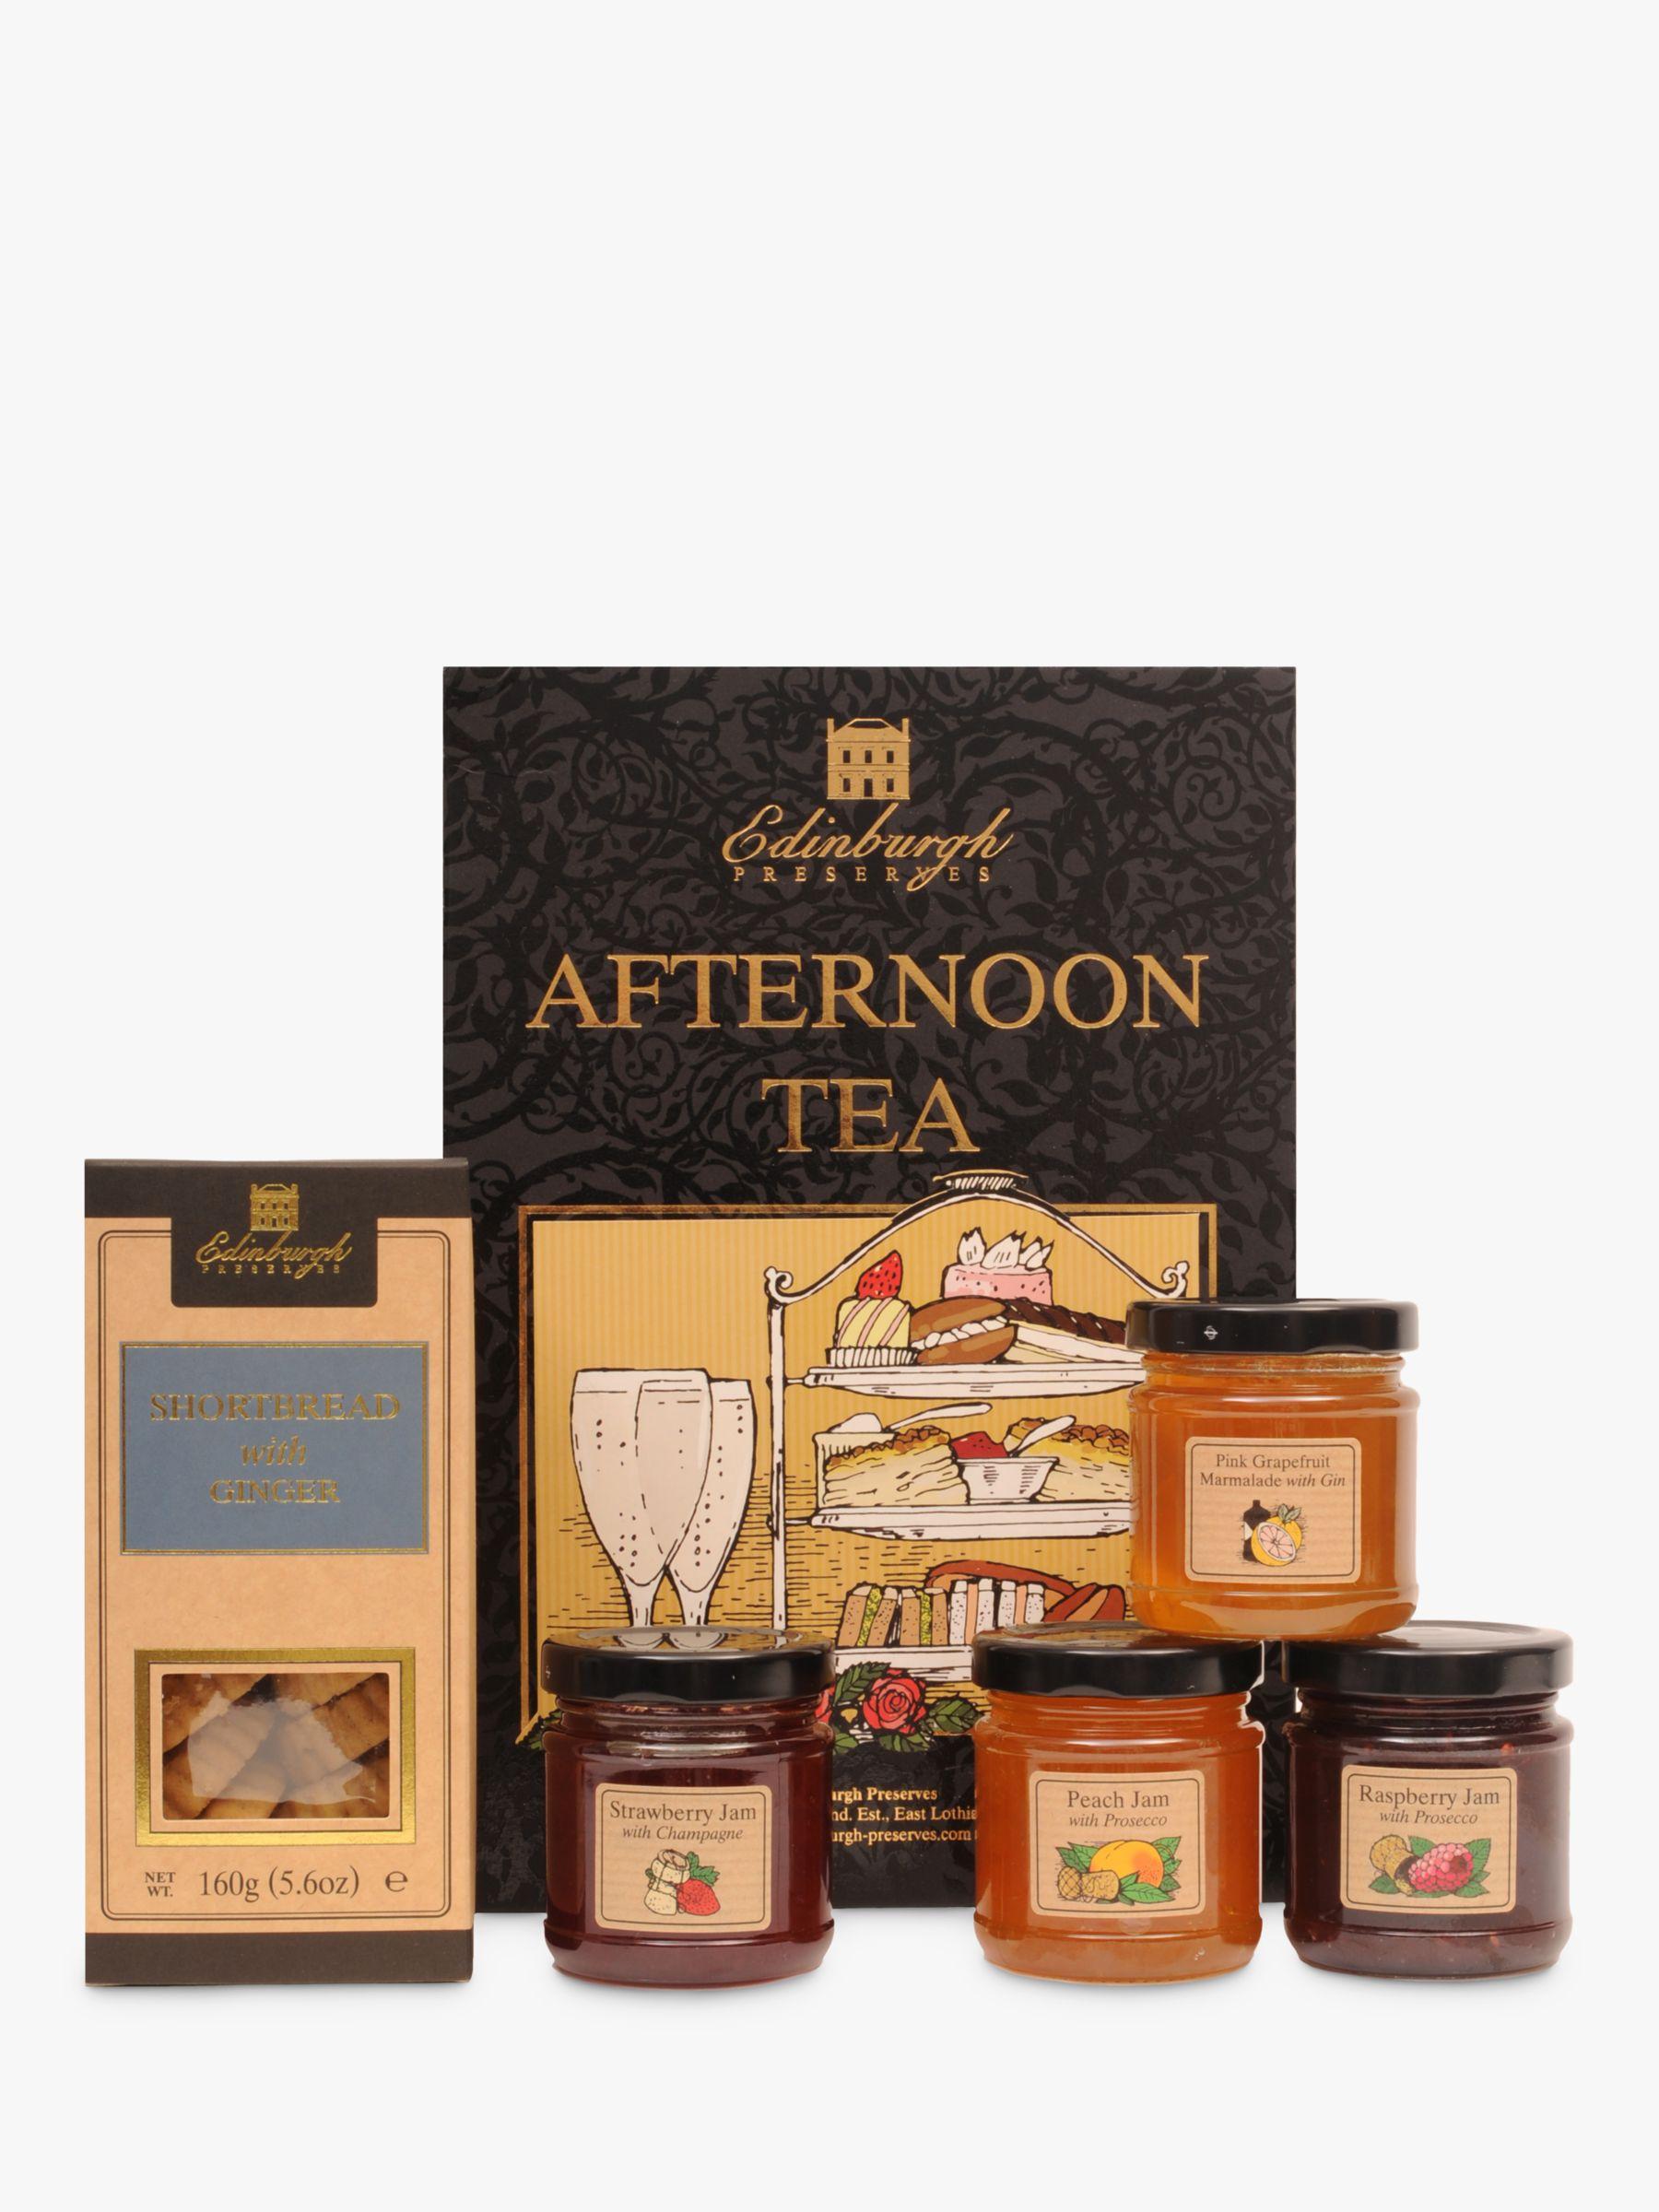 Edinburgh Preserves Afternoon Tea Jam Fizz Shortbread Gift Set 612g At John Lewis Partners